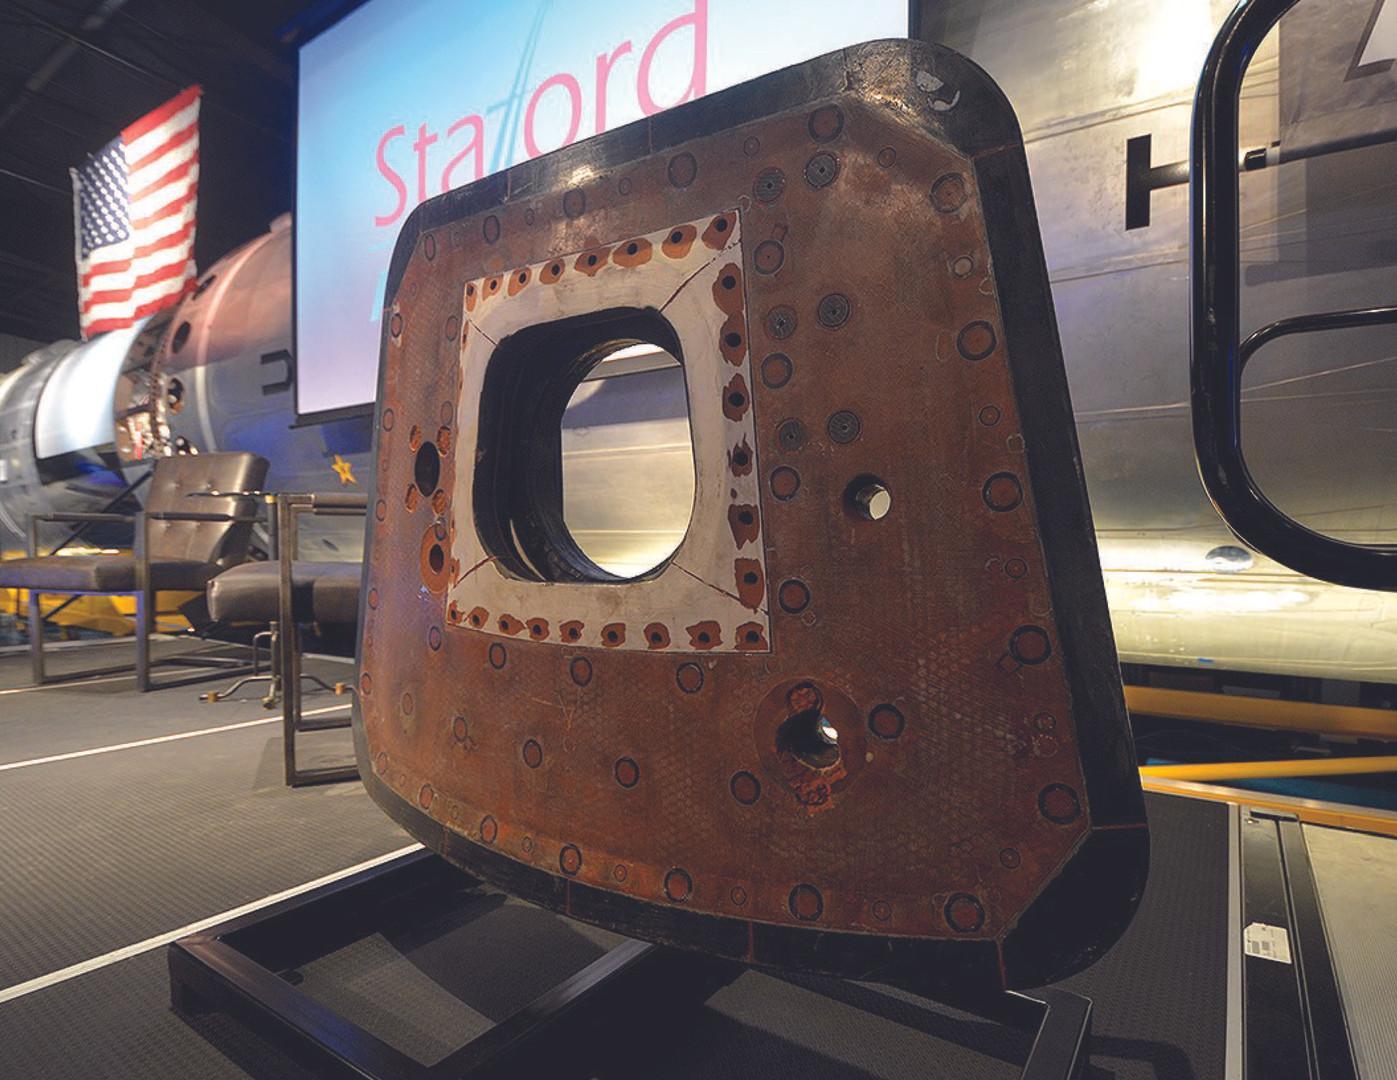 Apollo 10 Main Hatch